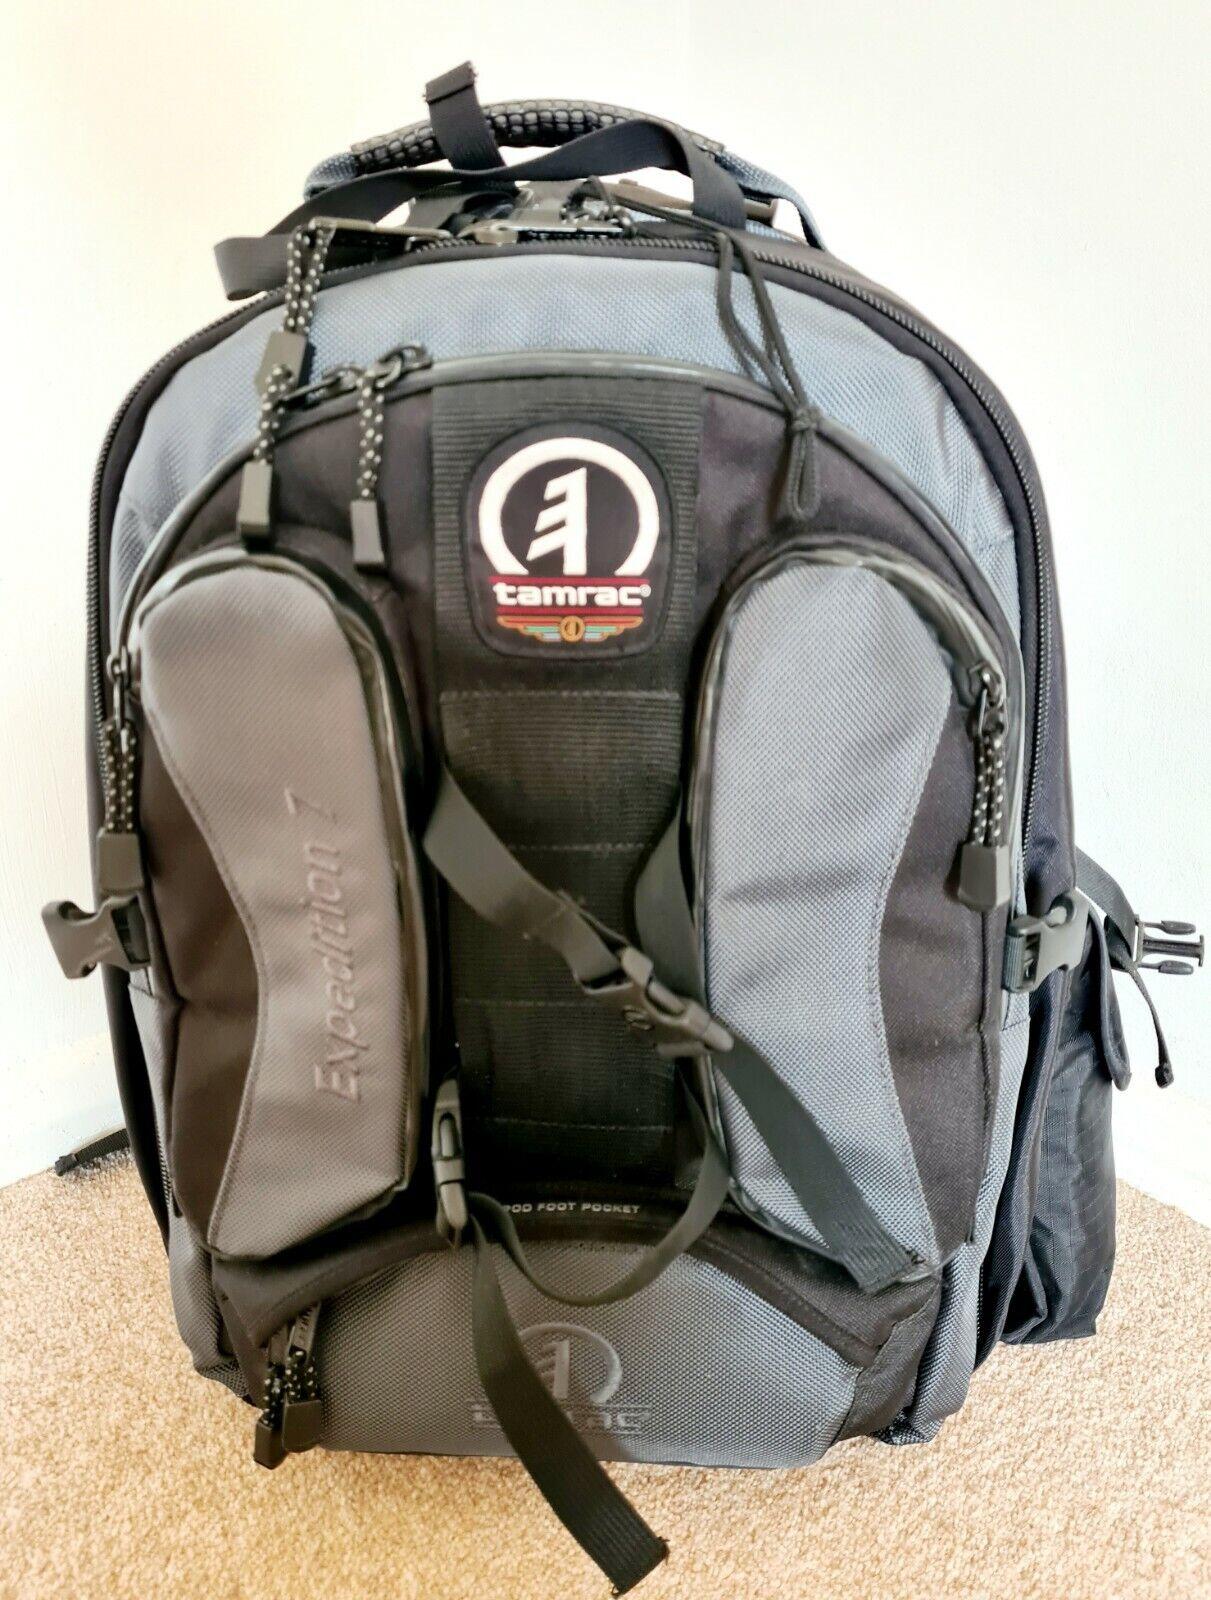 Tamrac Expedition 7 Camera Backpack, Rucksack, Bag - Used